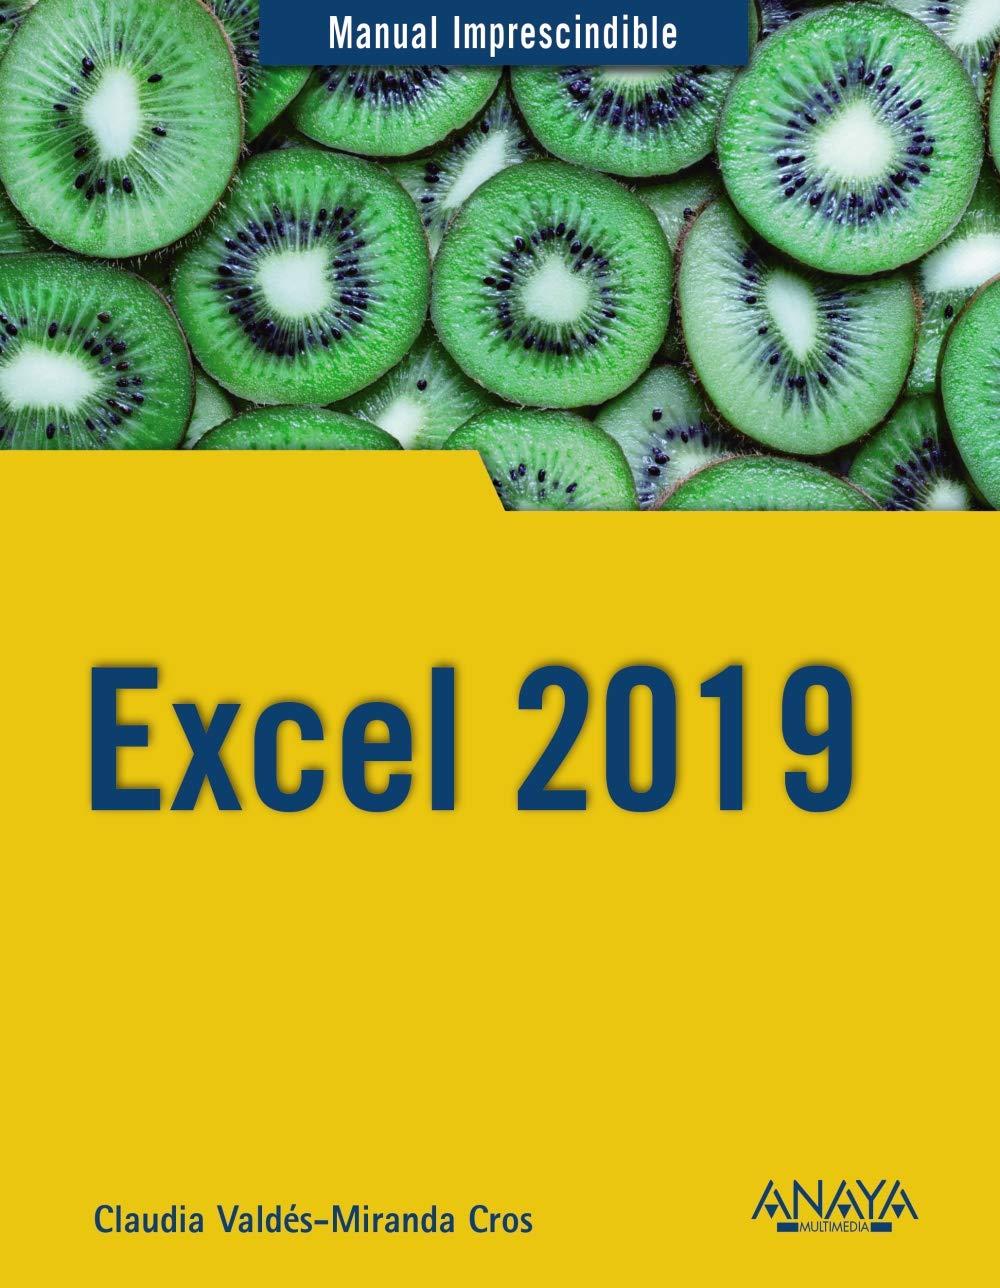 Excel 2019 (Manuales Imprescindibles)